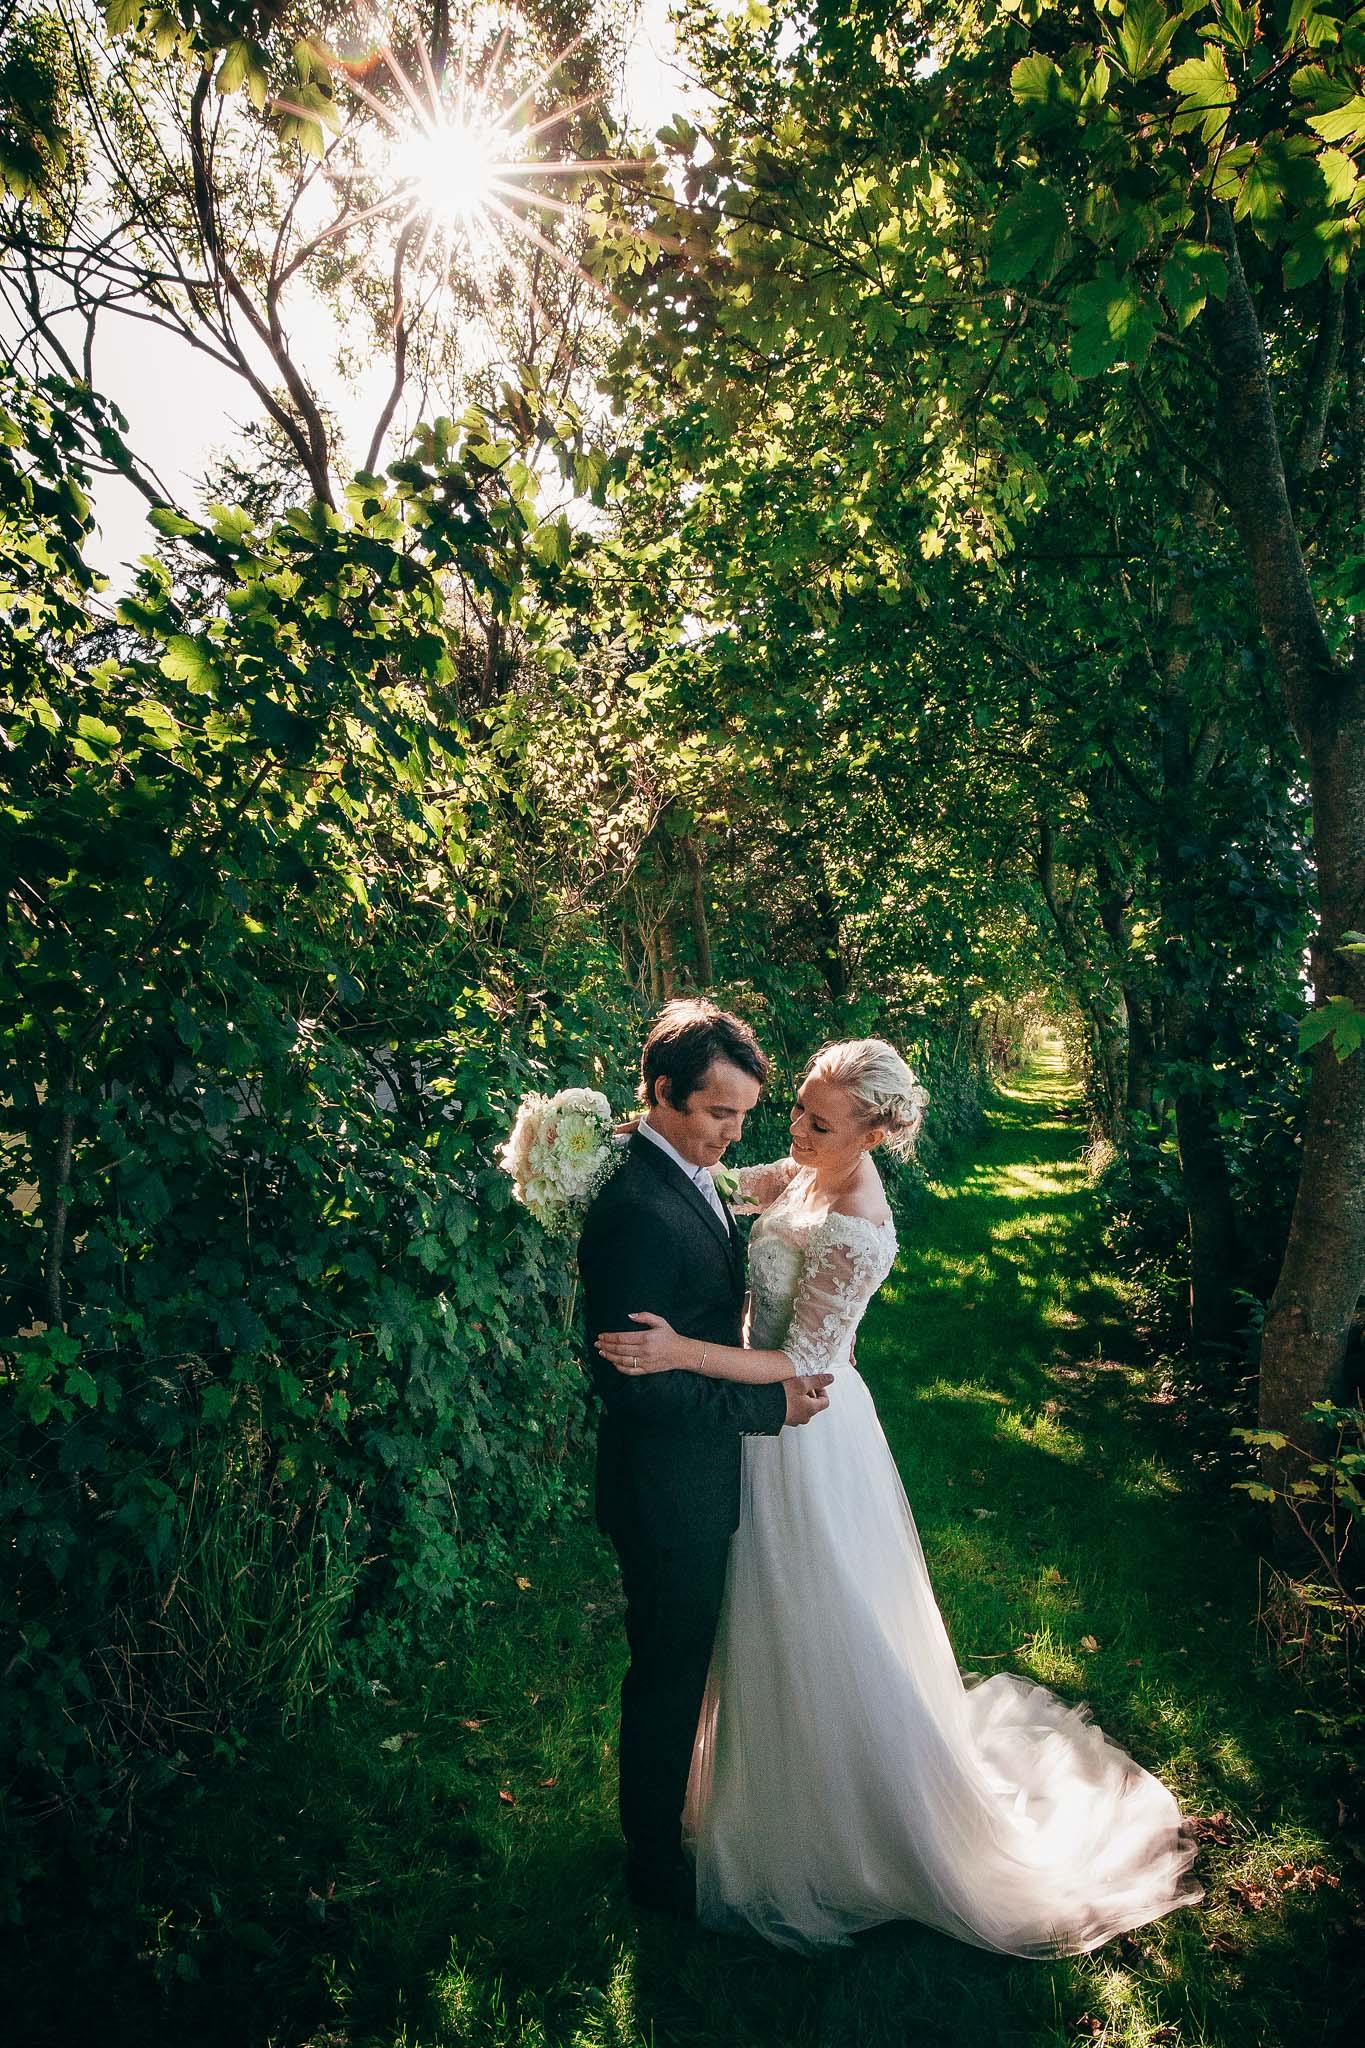 Wedding+Photographer+Norway+Bryllupsfotograf+Casey+Arneson+JT-104.jpg